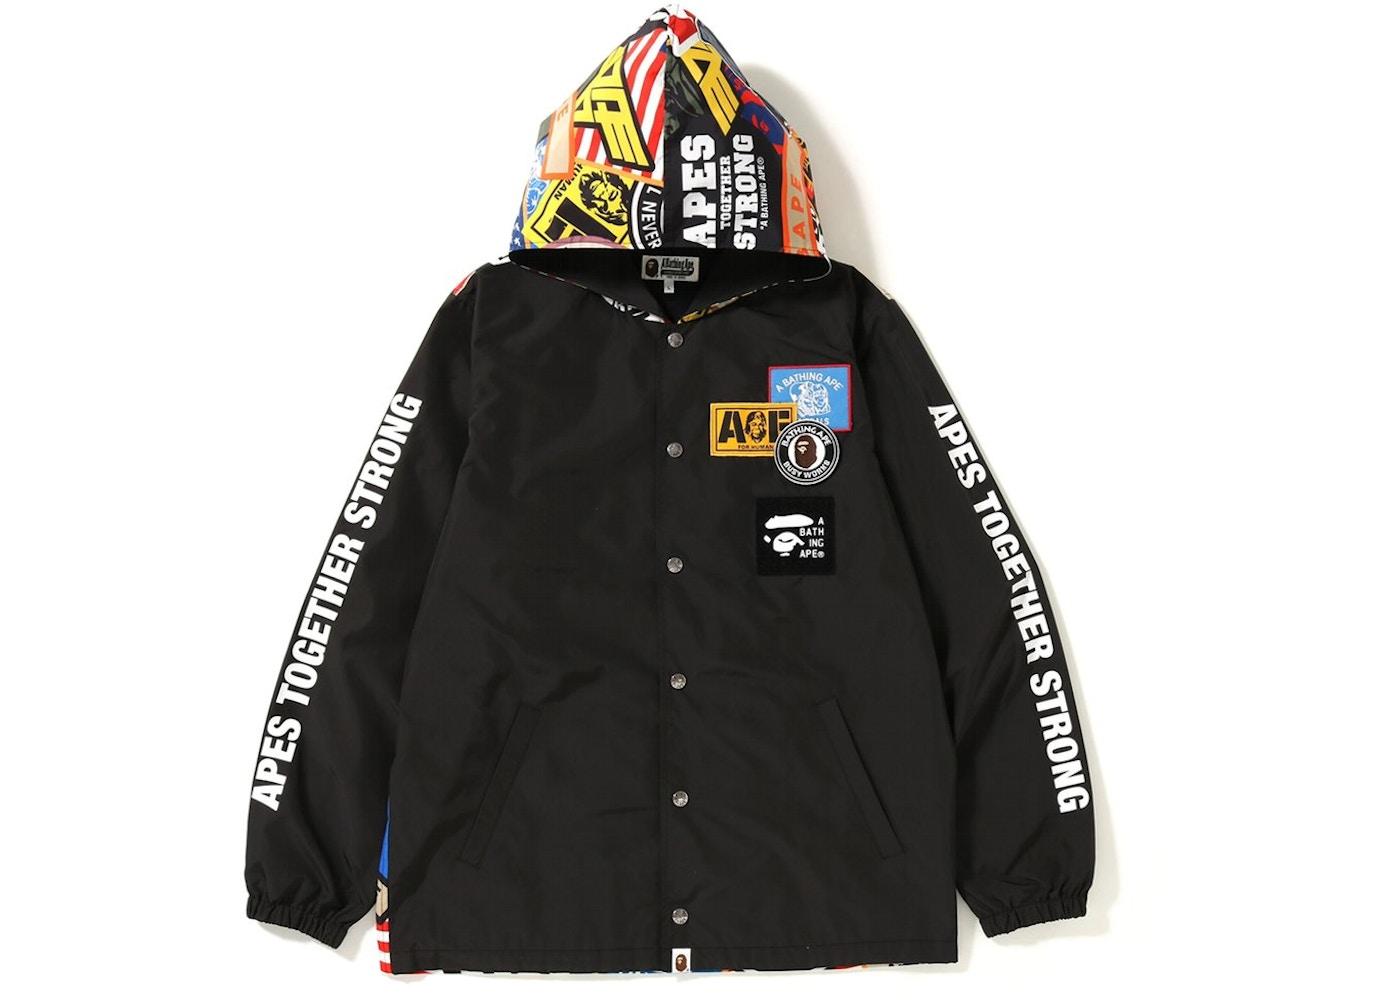 Bape Patched Hoodie Coach Jacket Black Fw18